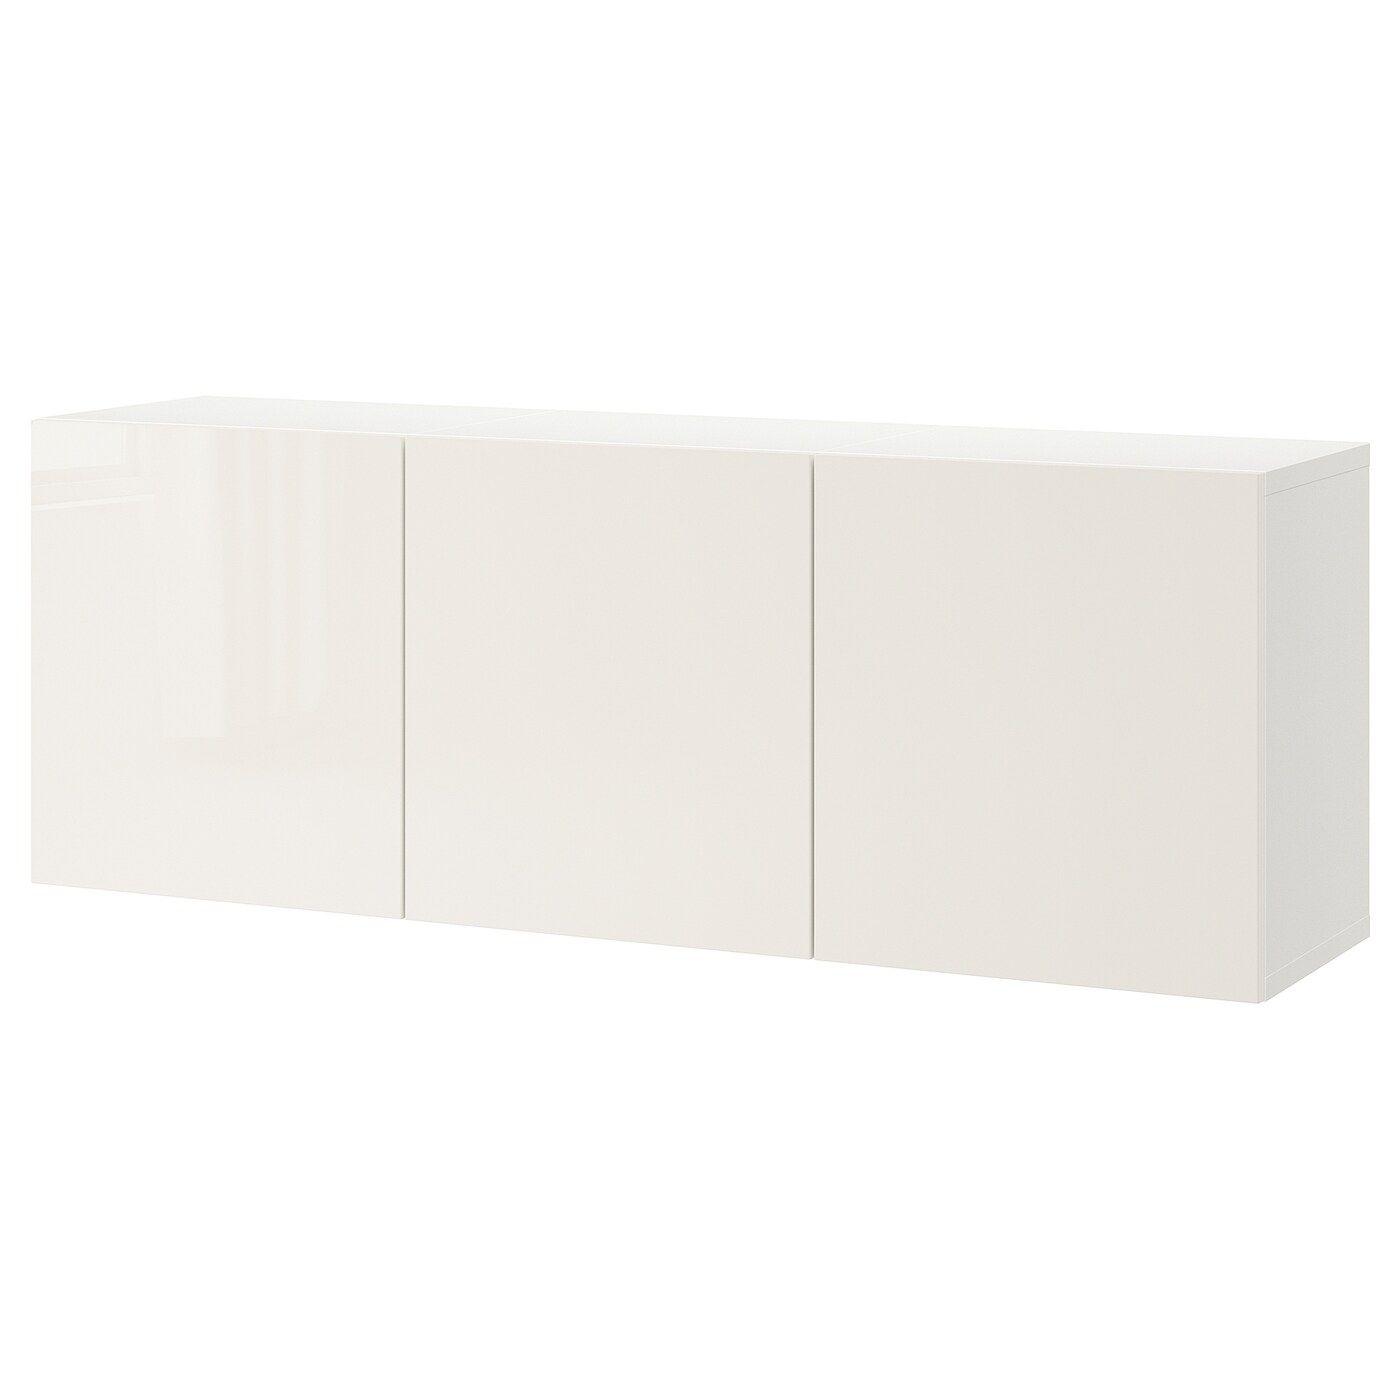 Besta Estanteria De Cubos Blanco Selsviken Alto Brillo Blanco 180x42x64 Cm Ikea In 2020 Ikea Hochglanz Schrank